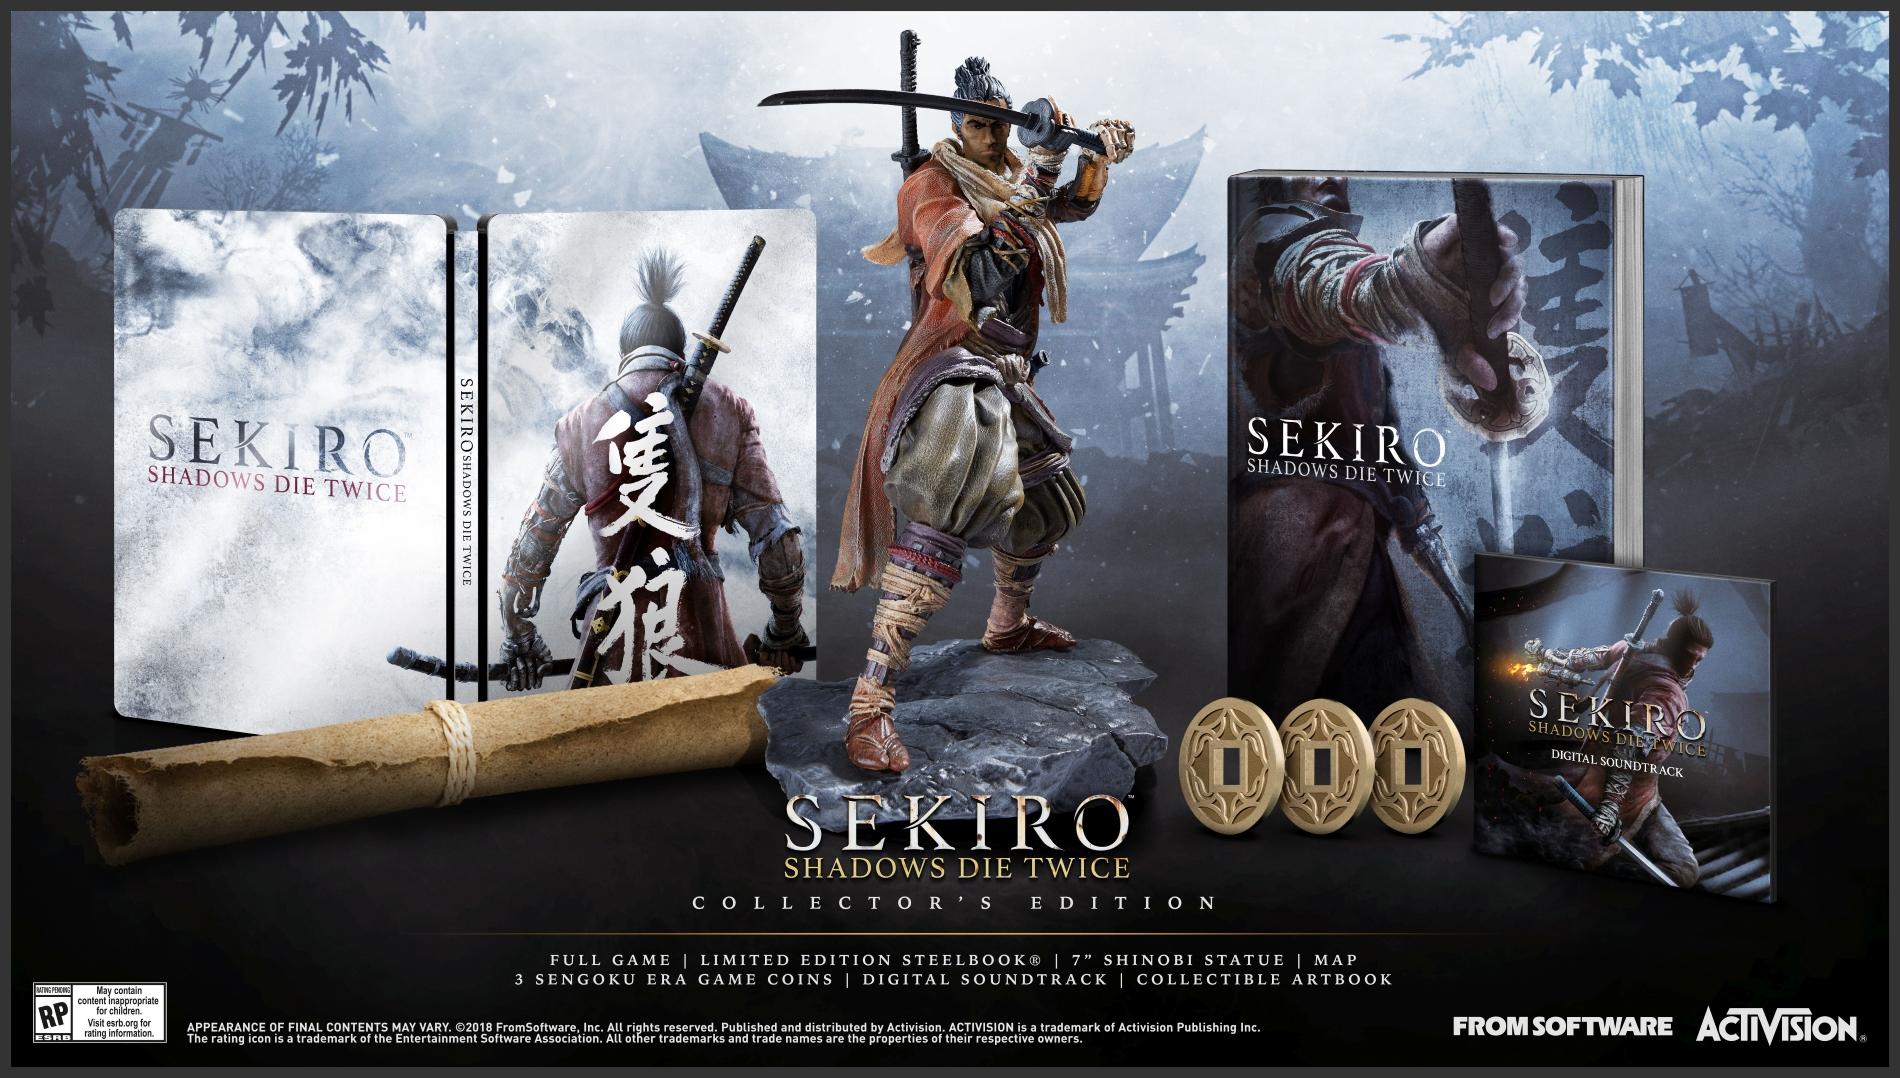 Shadows Die Twice tendrá edición de colección — Sekiro